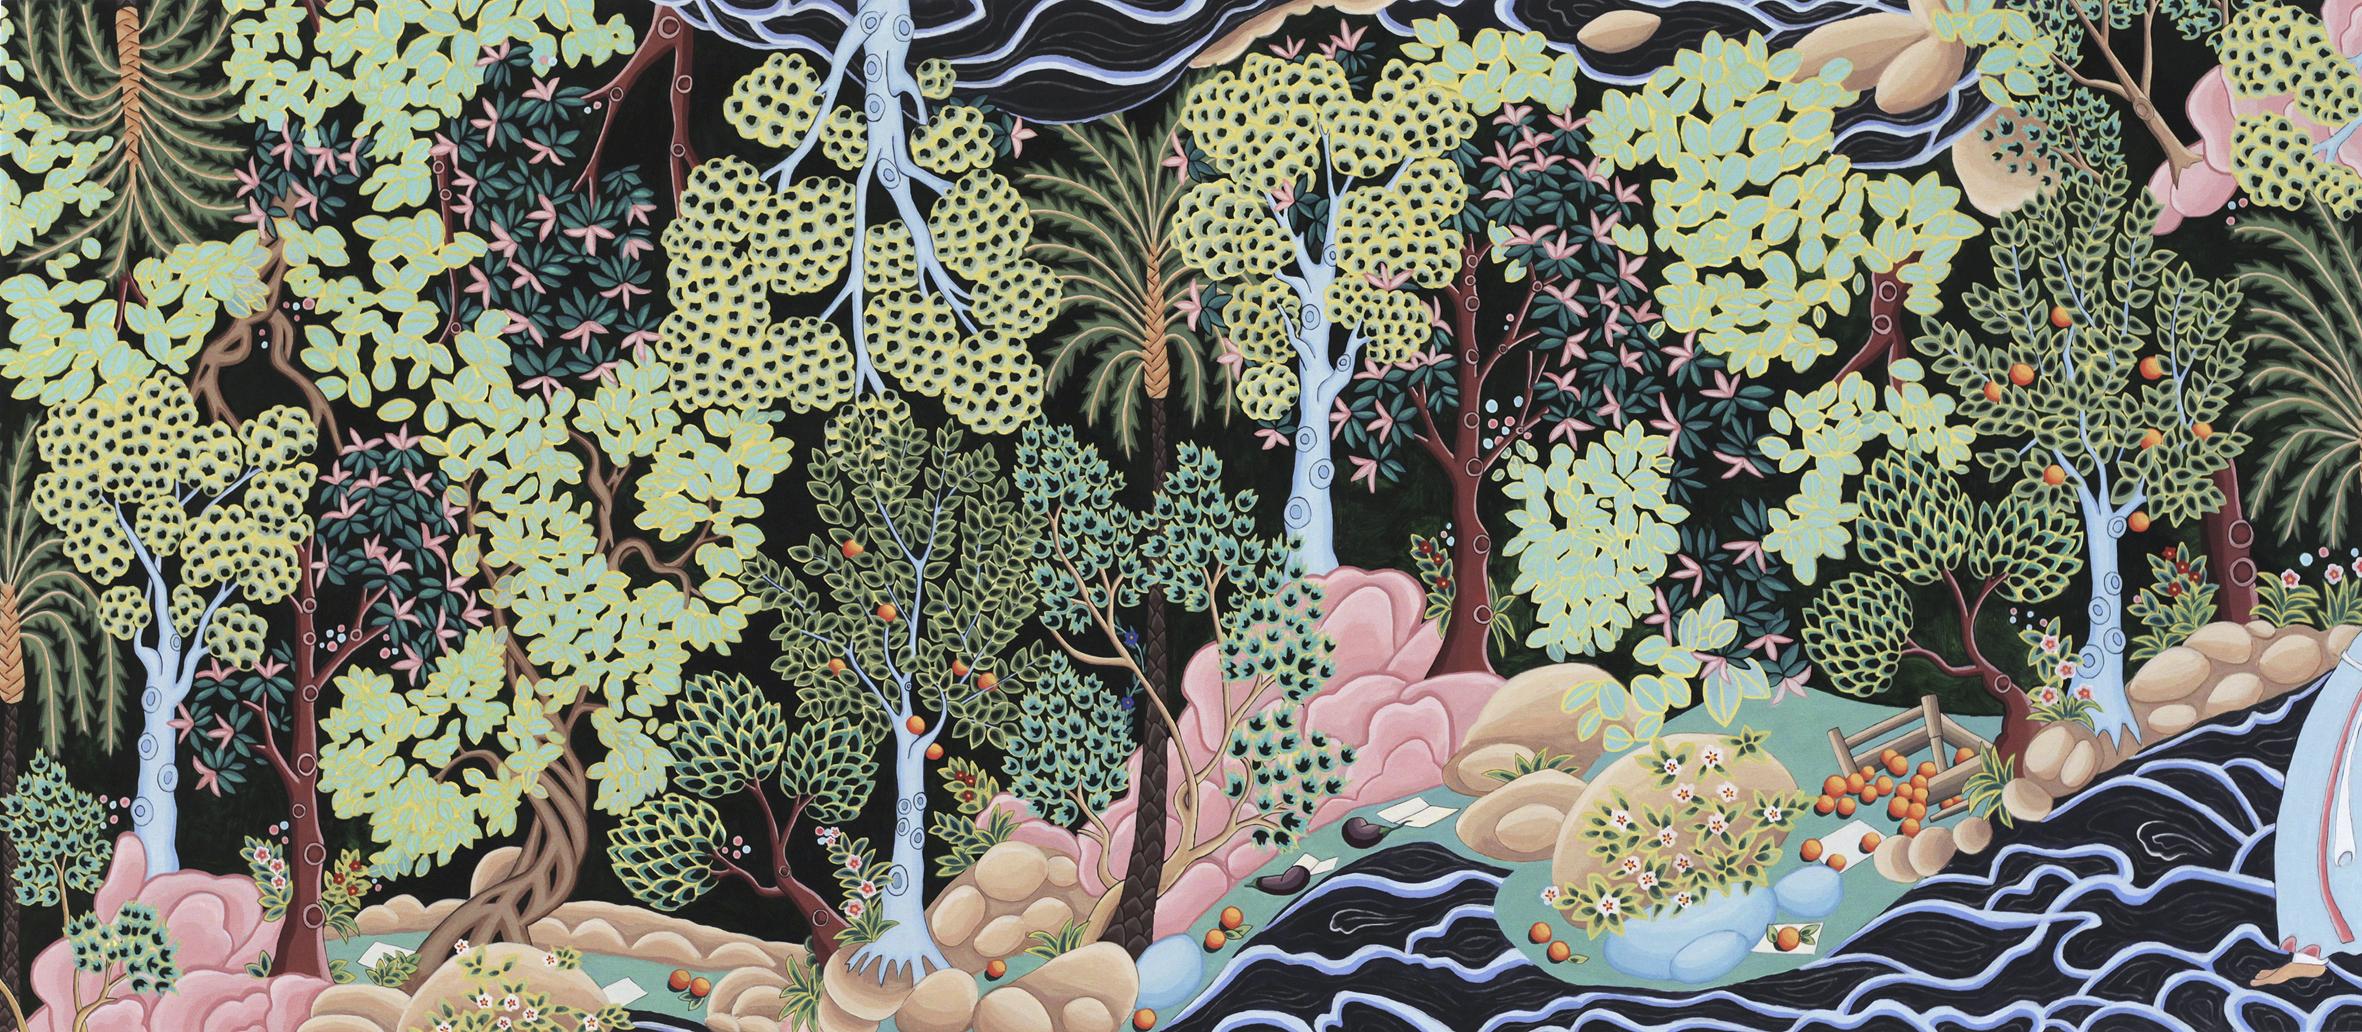 Land of Darkness (Al-Khidr) , 55 x 125 cm, handmade egg tempera on wood panel, 2018